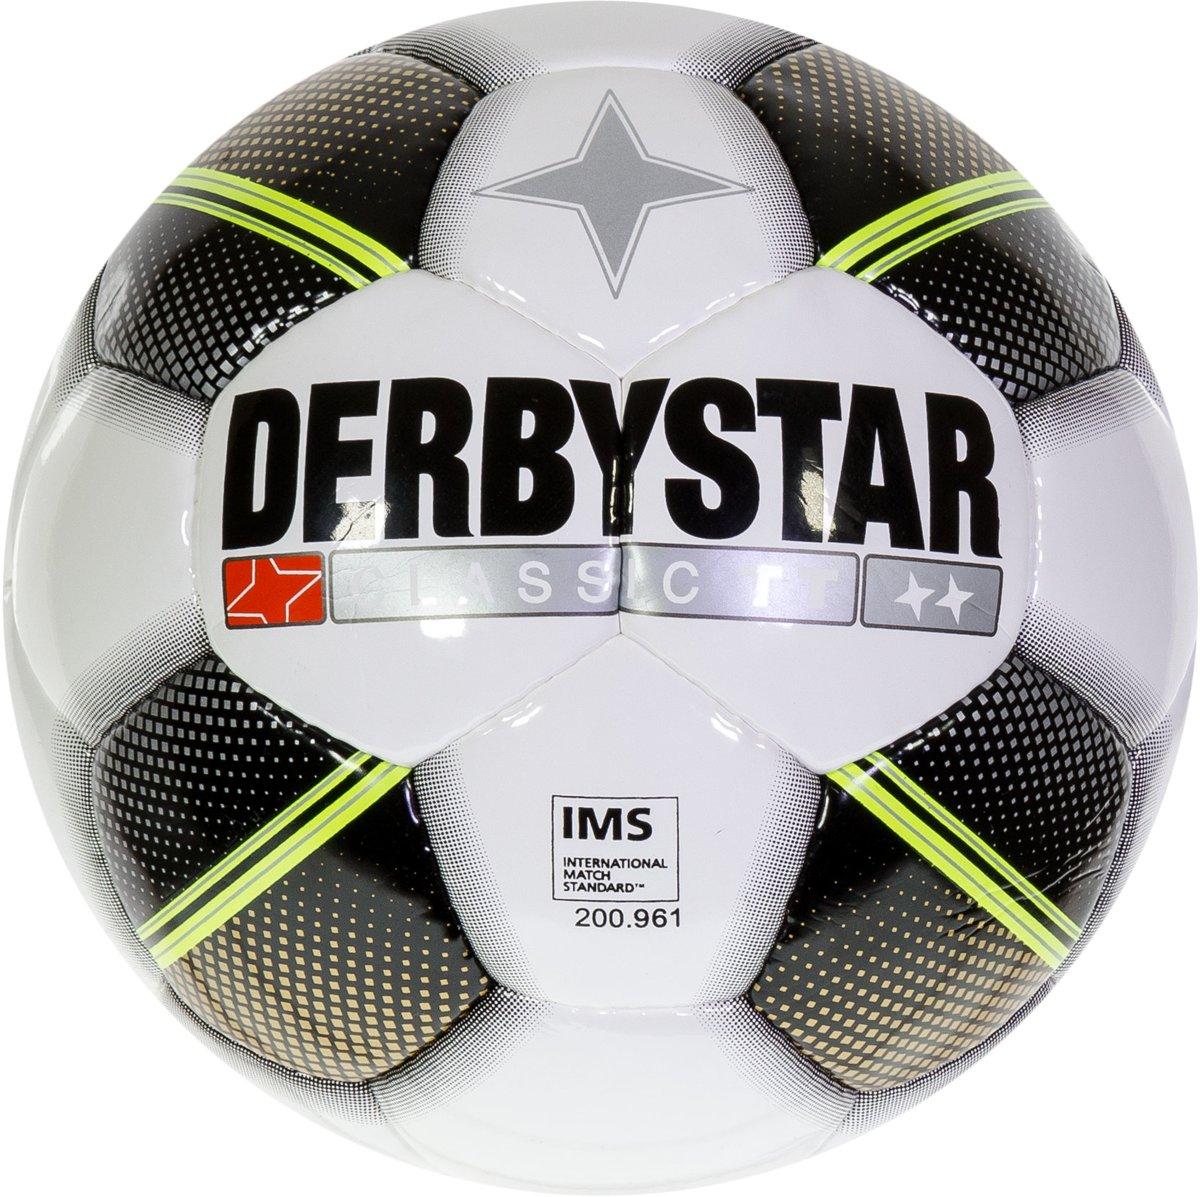 Derbystar Classic TT - wit/zwart/goud